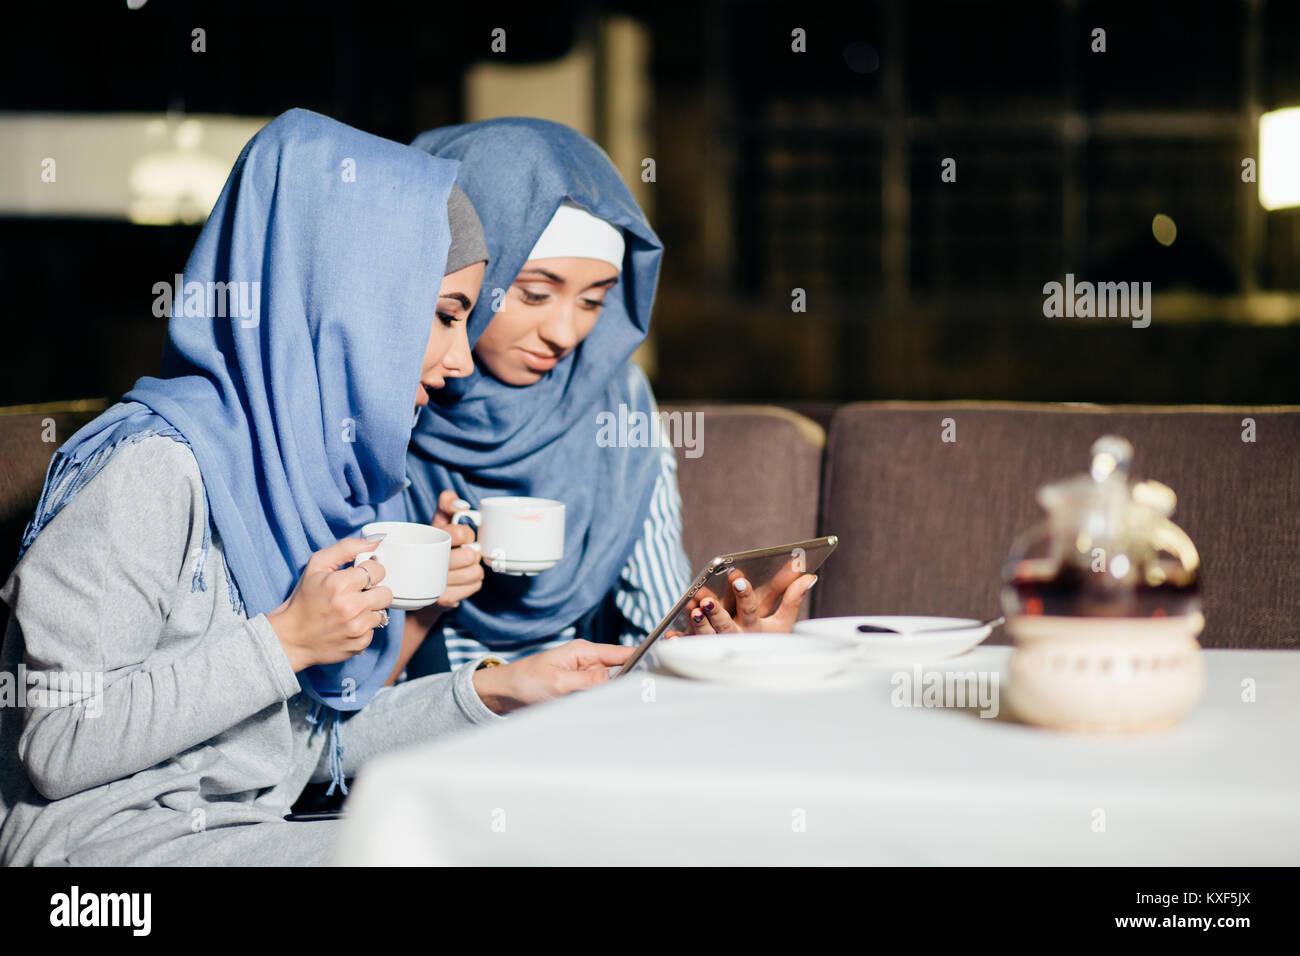 Jolie femme musulmane utiliser tablet in cafe Photo Stock